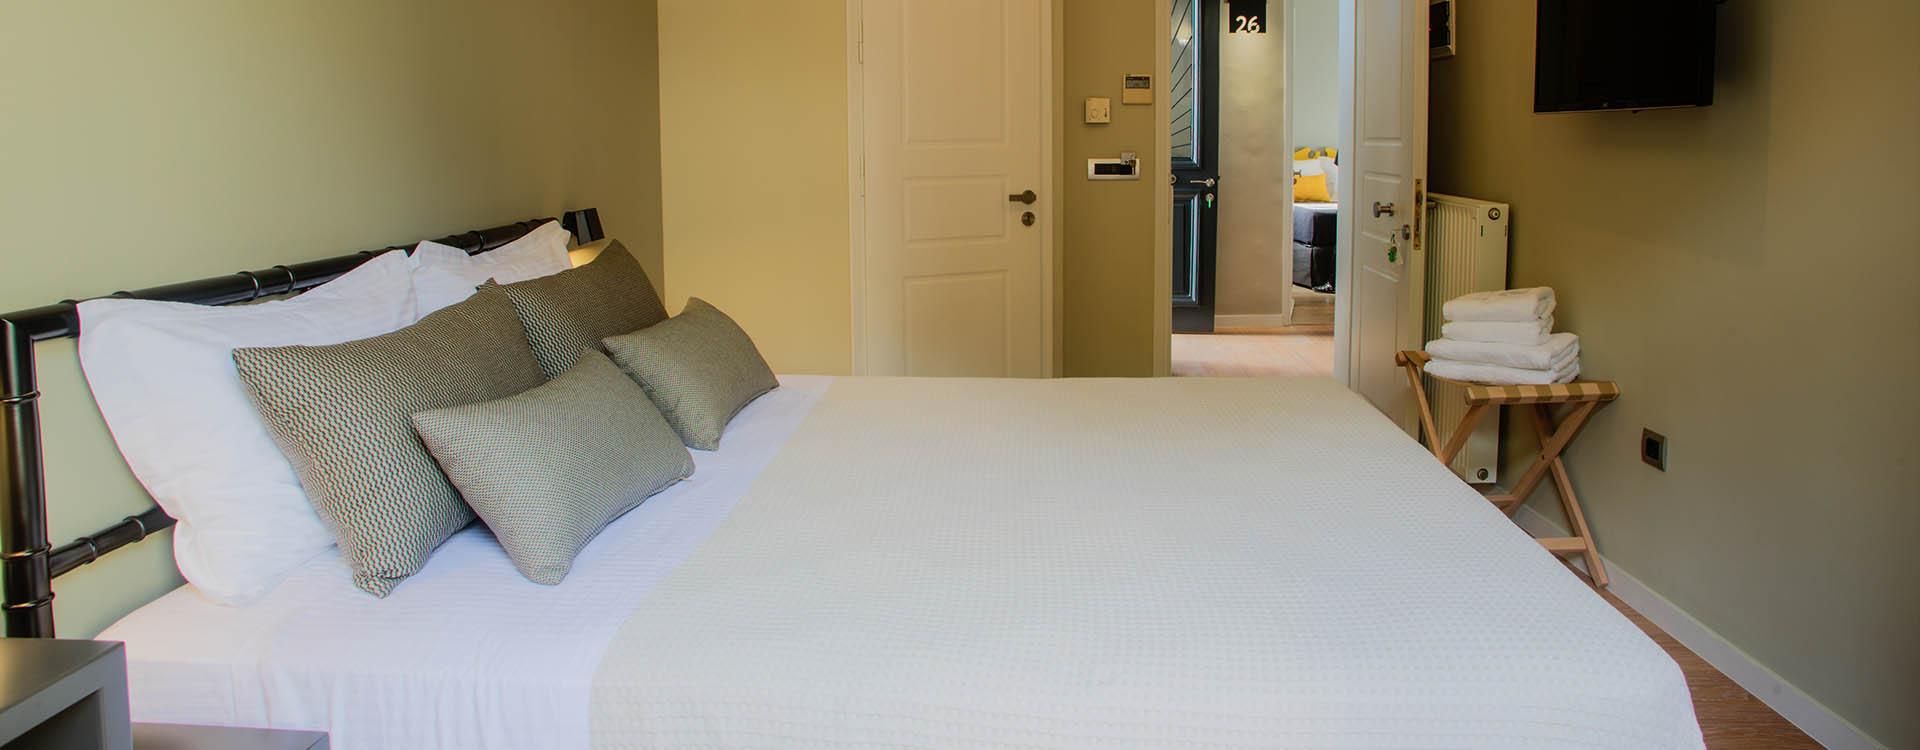 accommodation nafplio - aethra boutique rooms